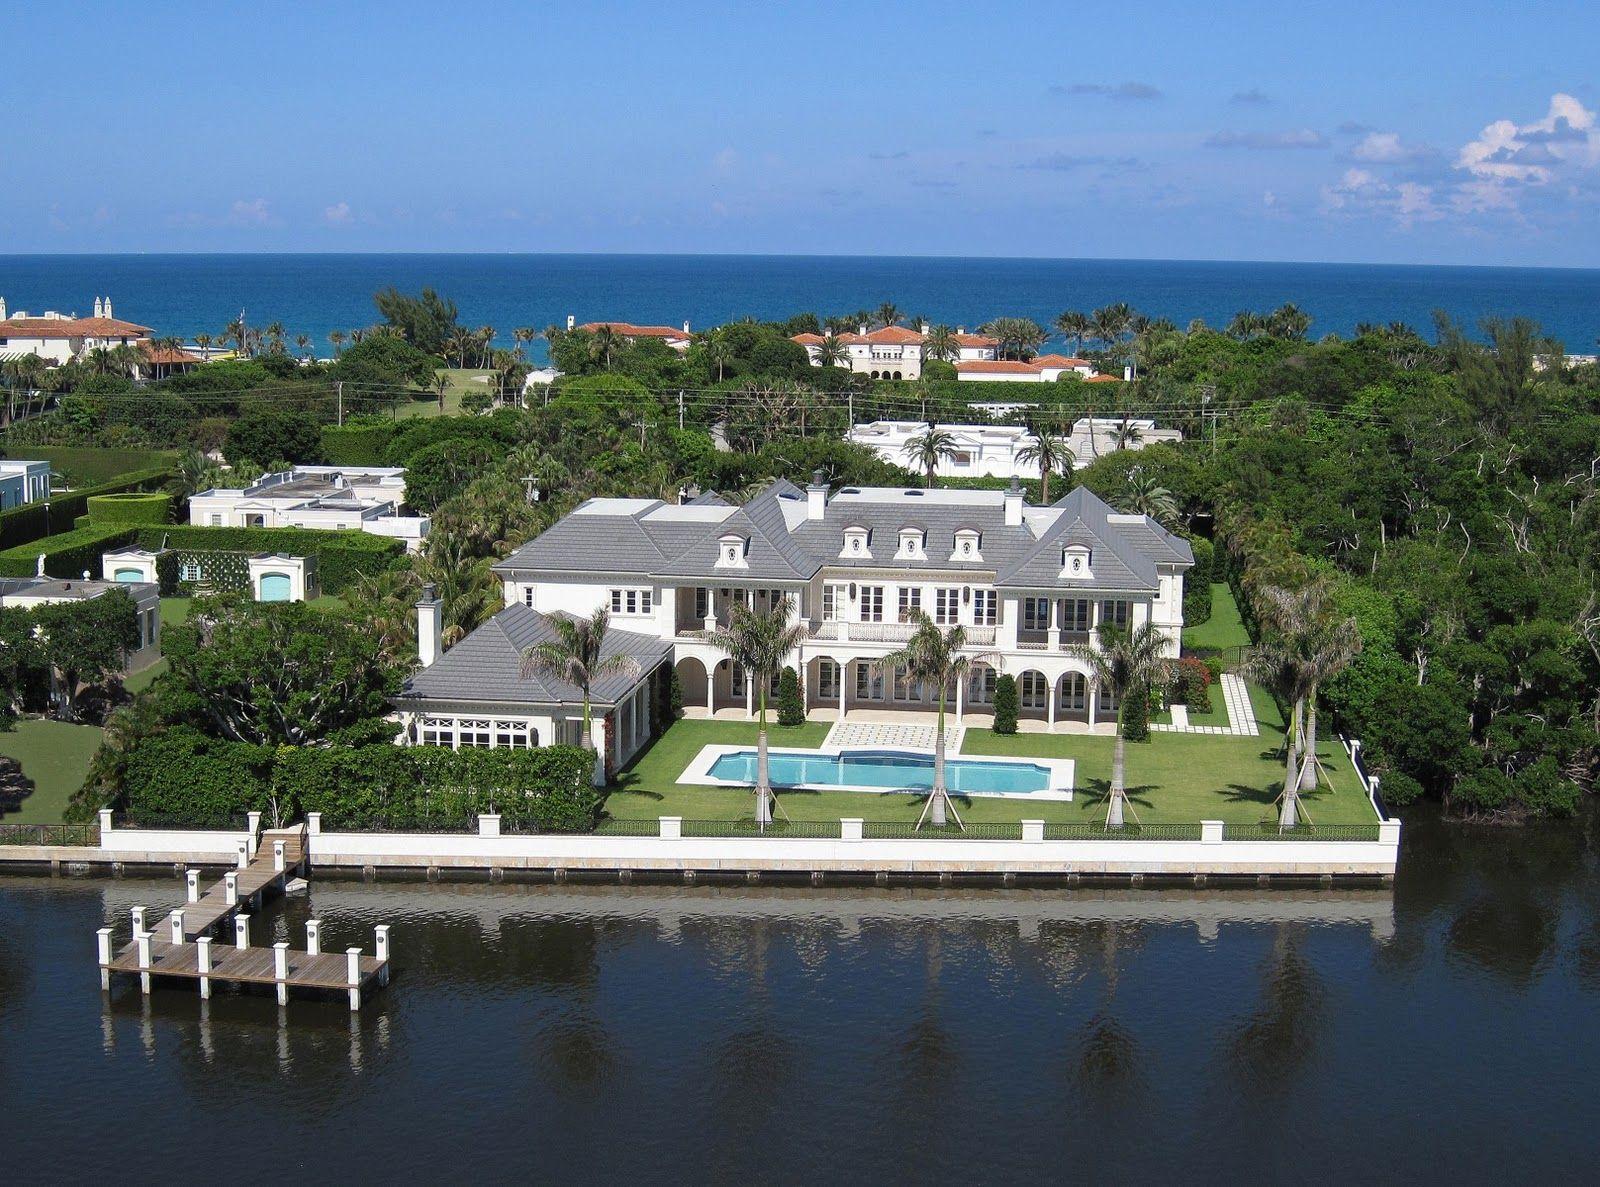 Dan Swanson Of Addison Development Palm Beach Florida